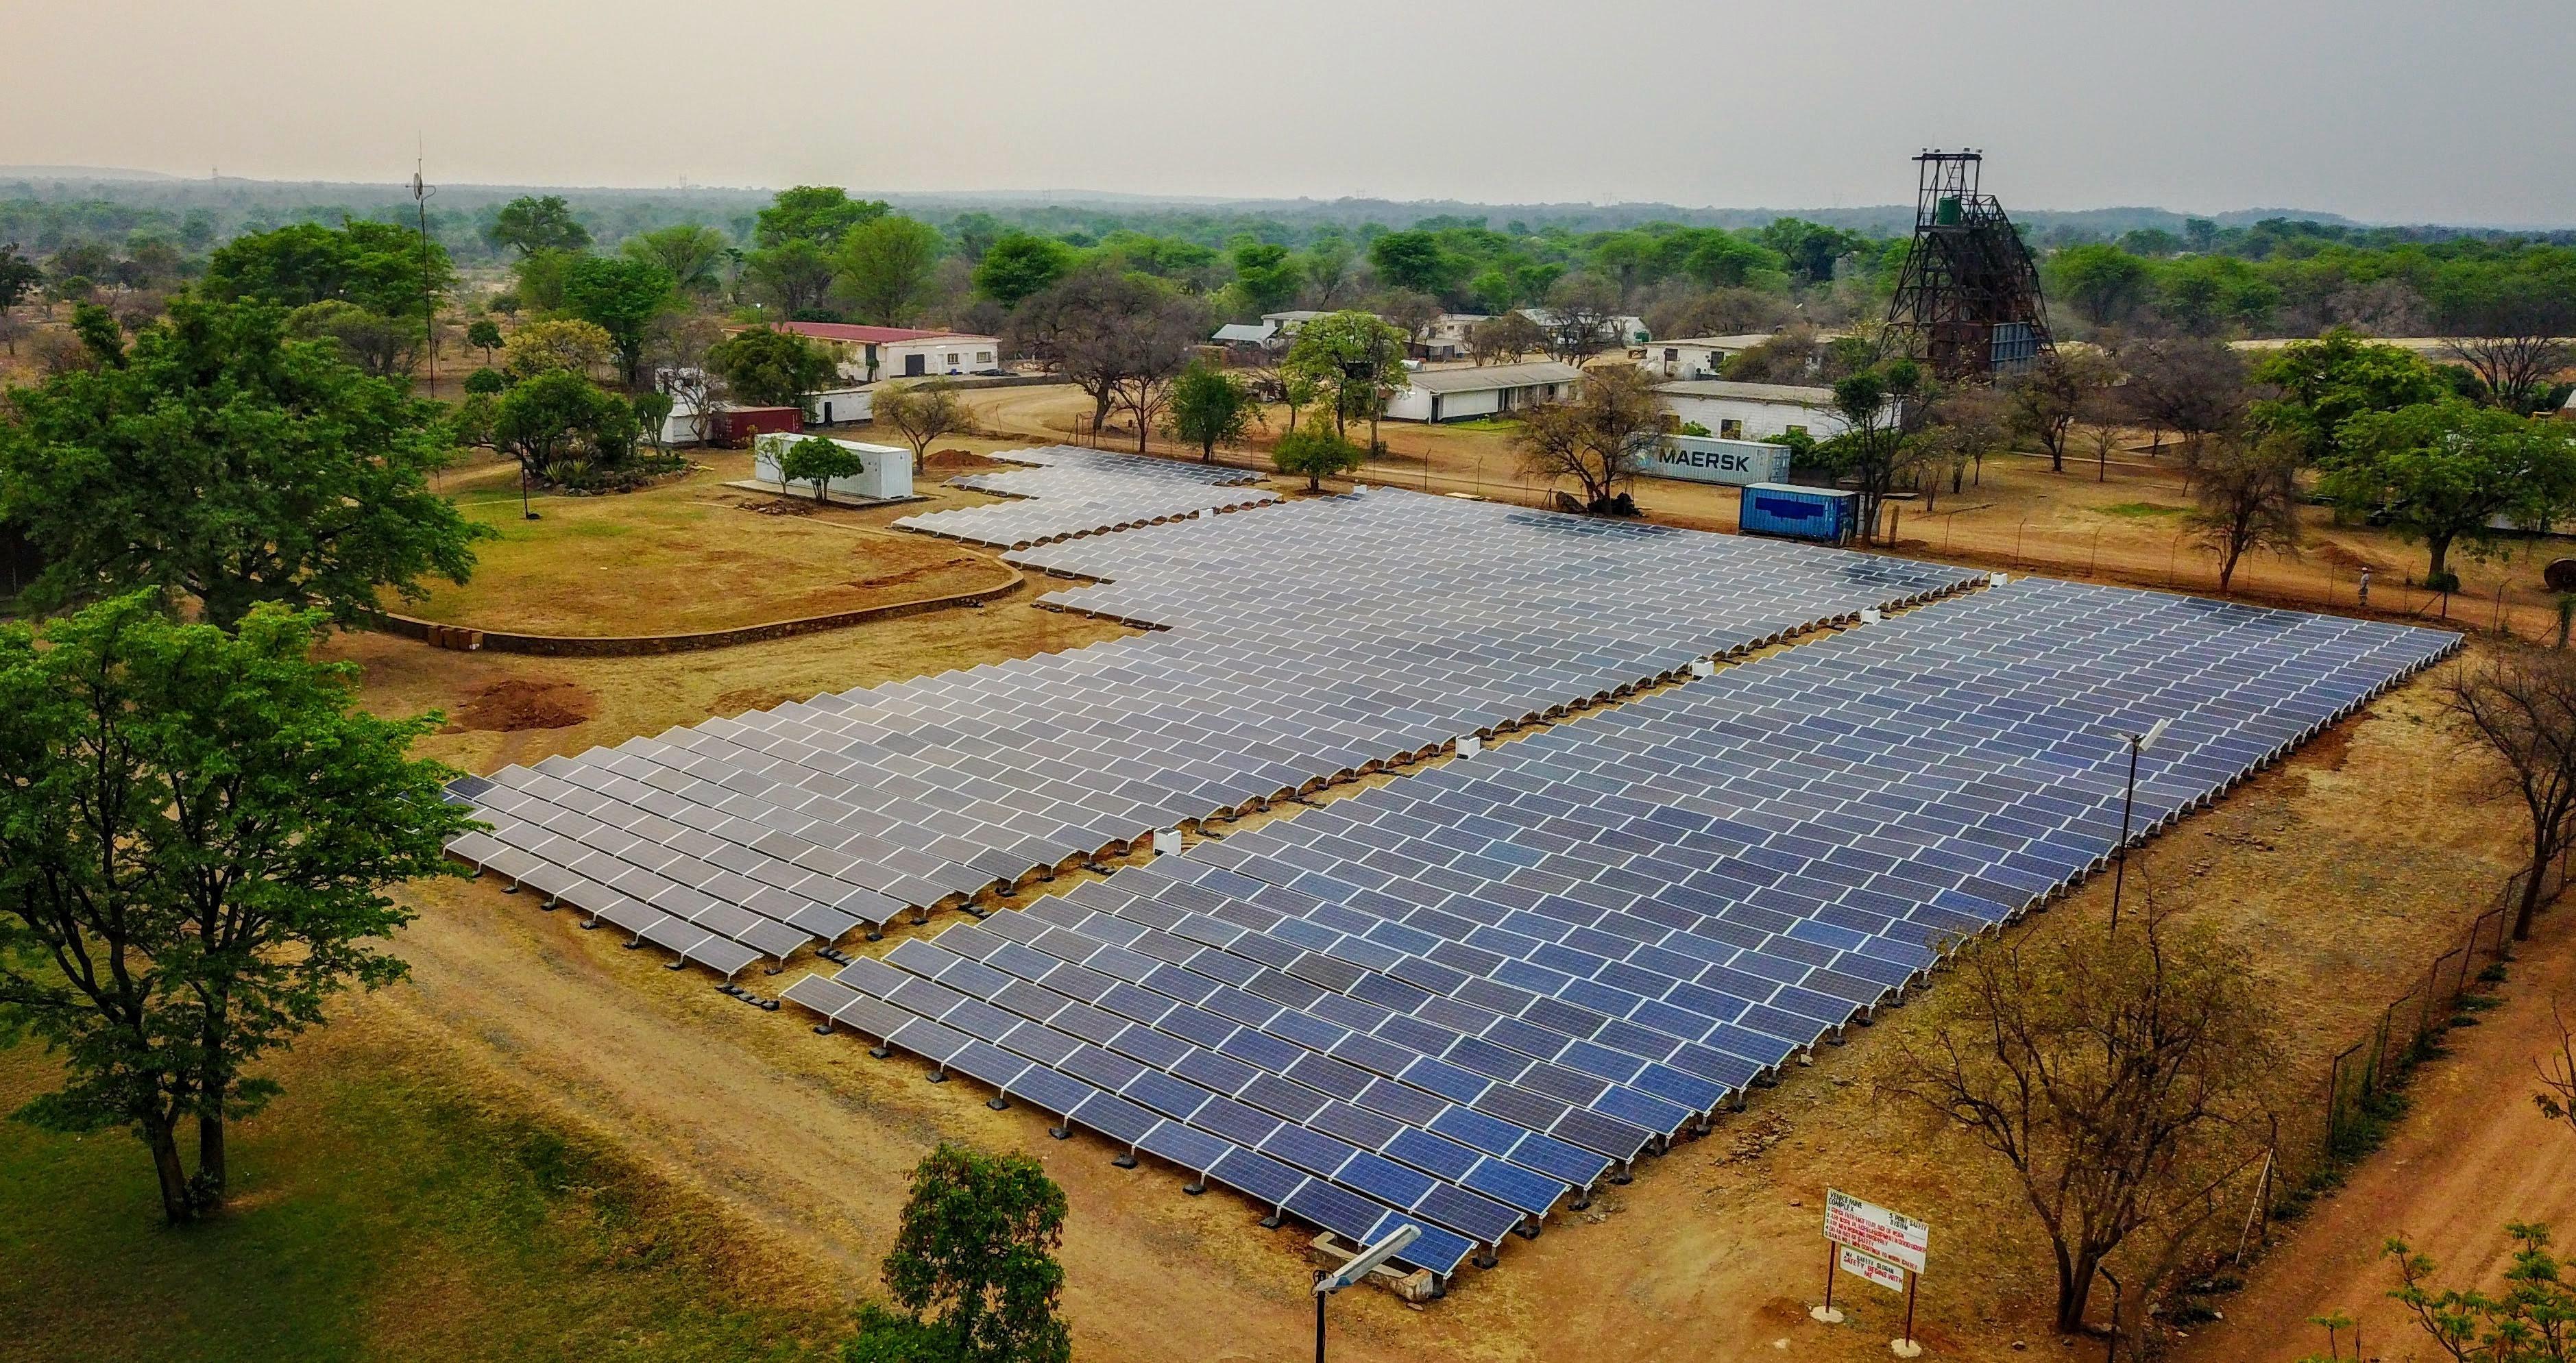 Solar panels in Zimbabwe